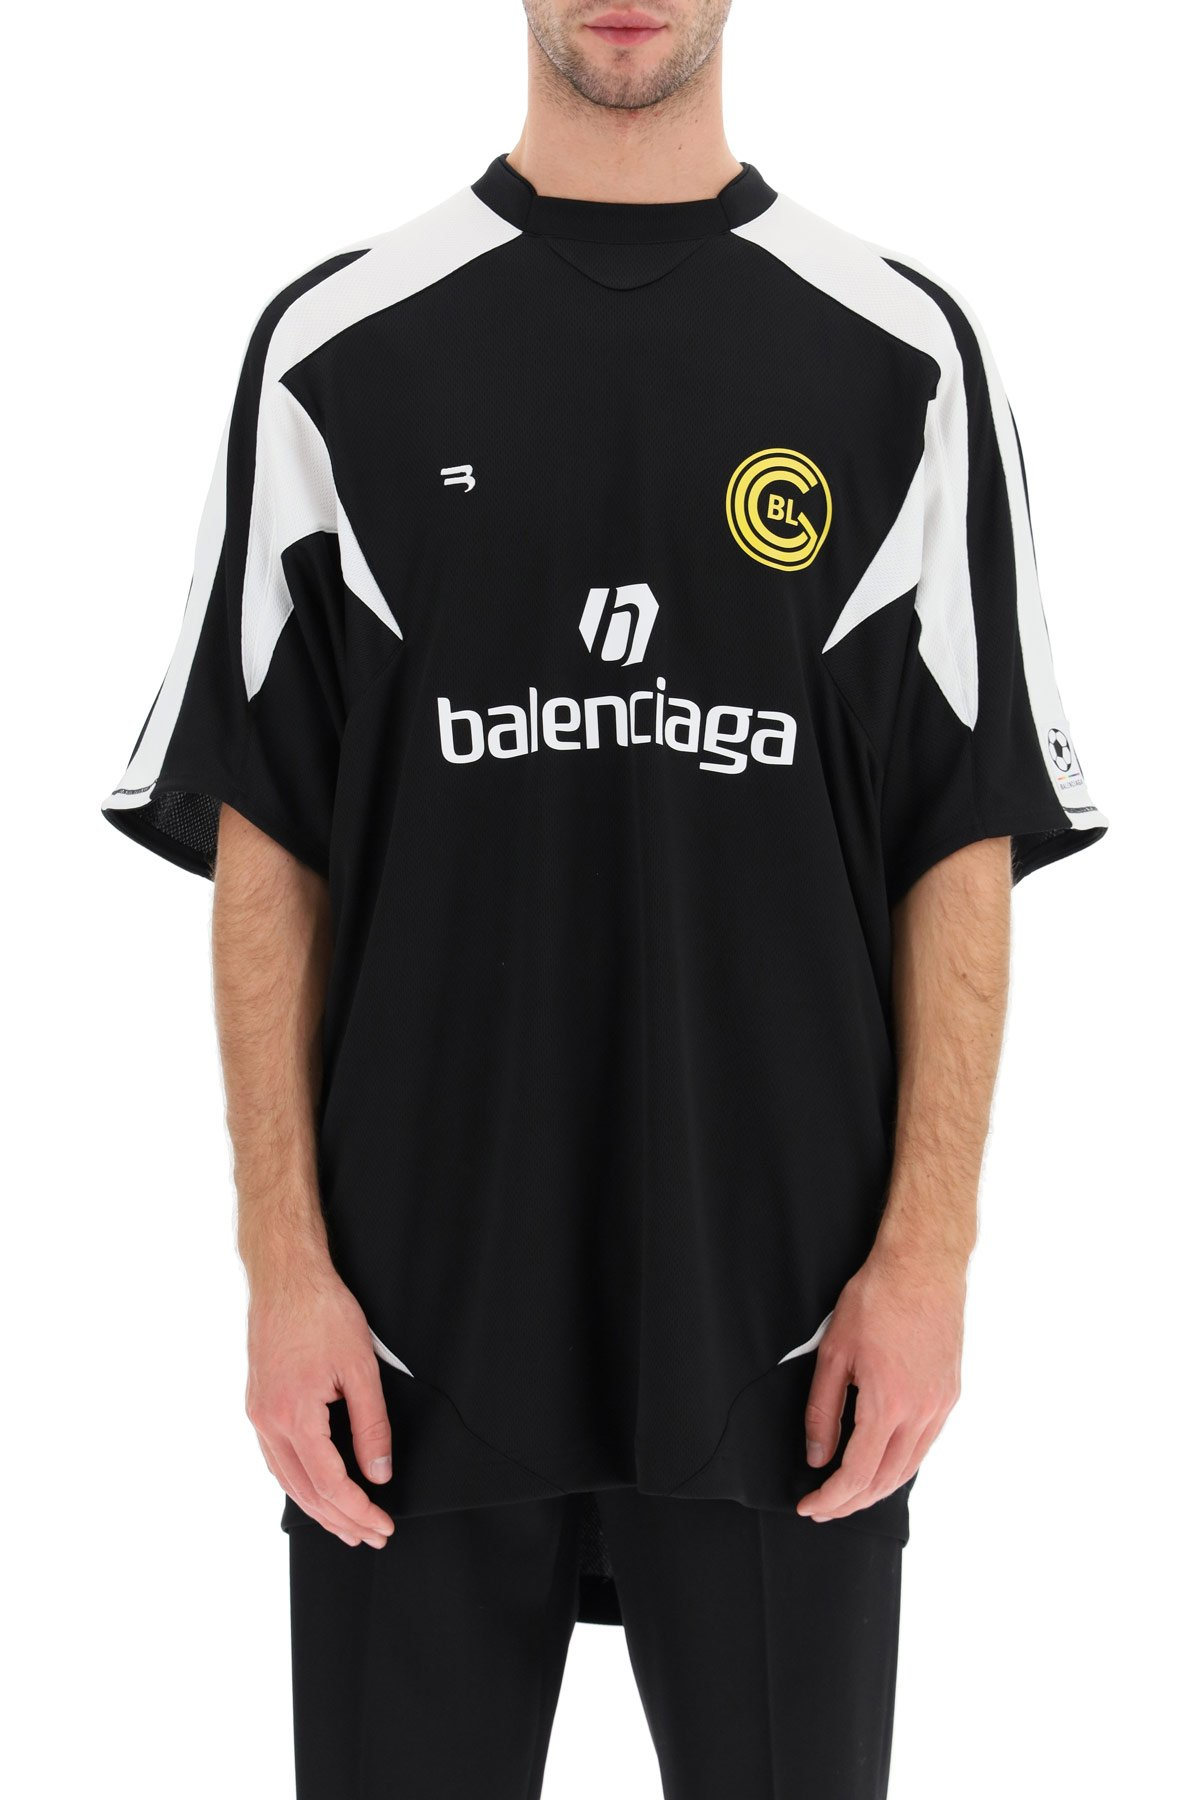 Balenciaga t-shirt stampa soccer